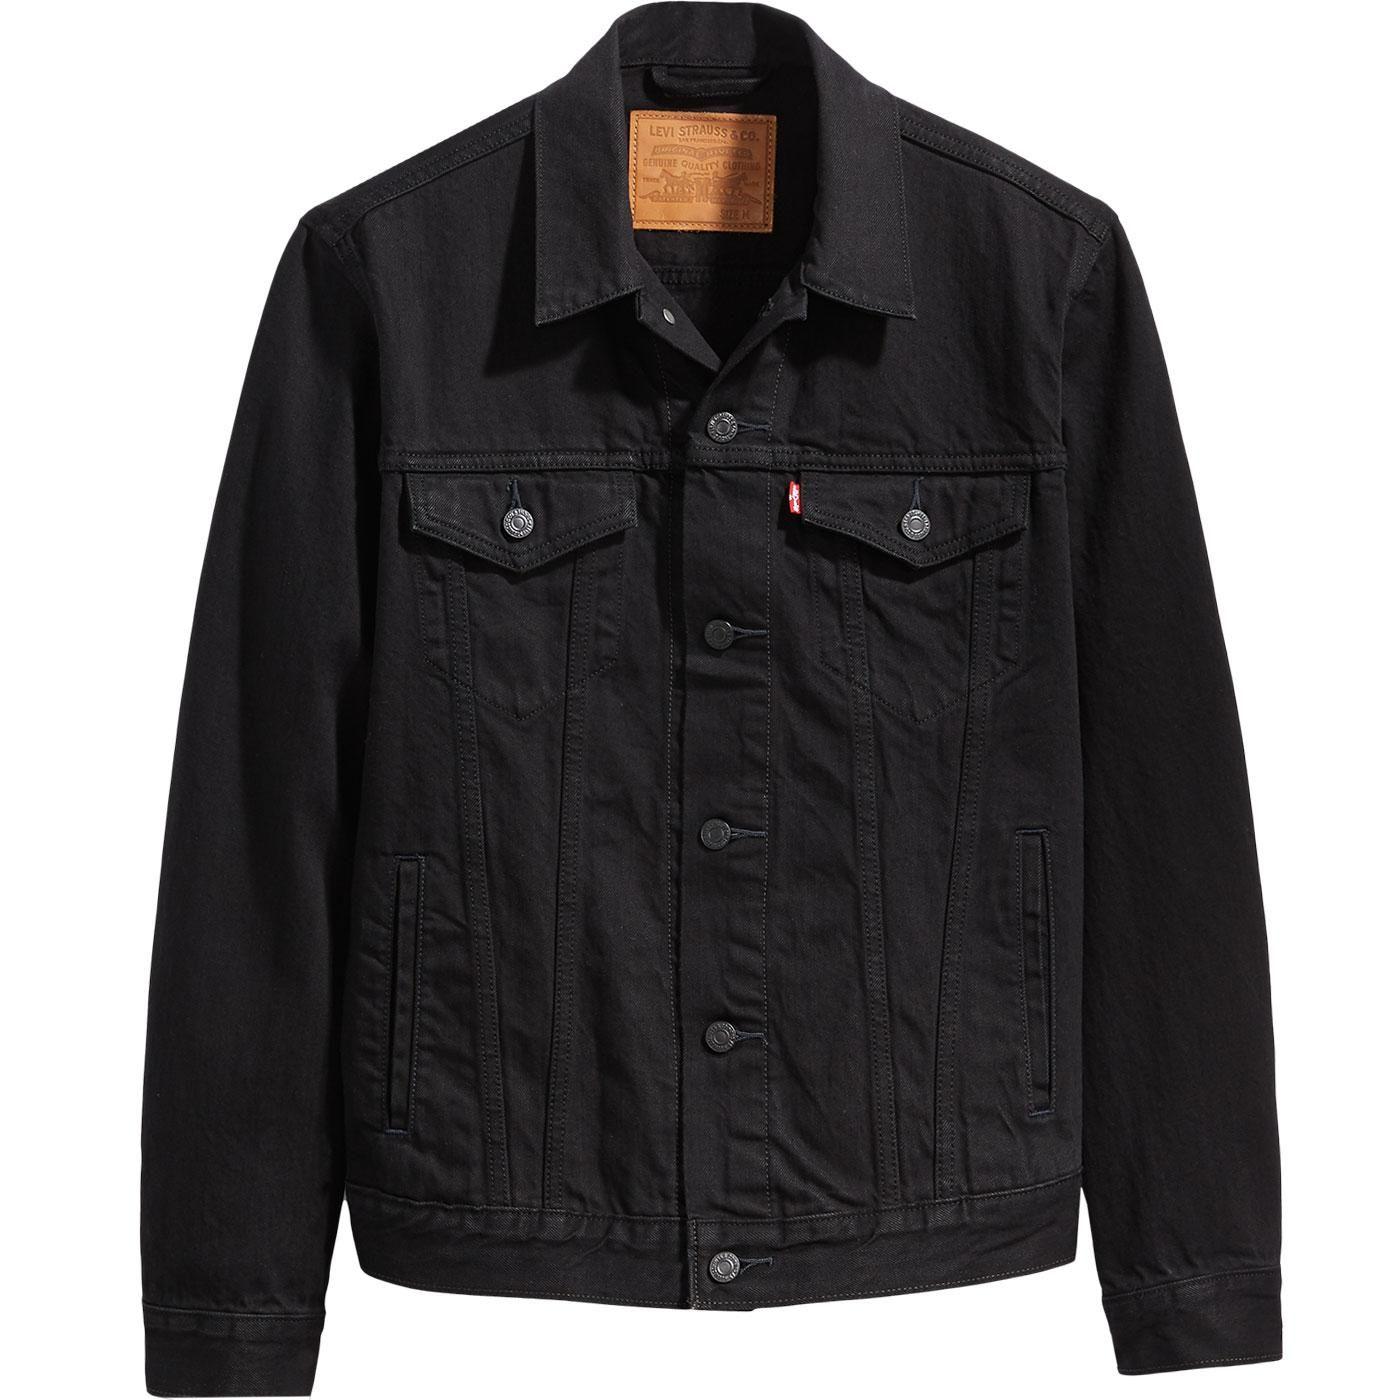 Levi S Men S Retro Mod Denim Trucker Jacket In Berk Black Black Denim Jacket Outfit Black Denim Jacket Denim Jacket [ 1400 x 1400 Pixel ]